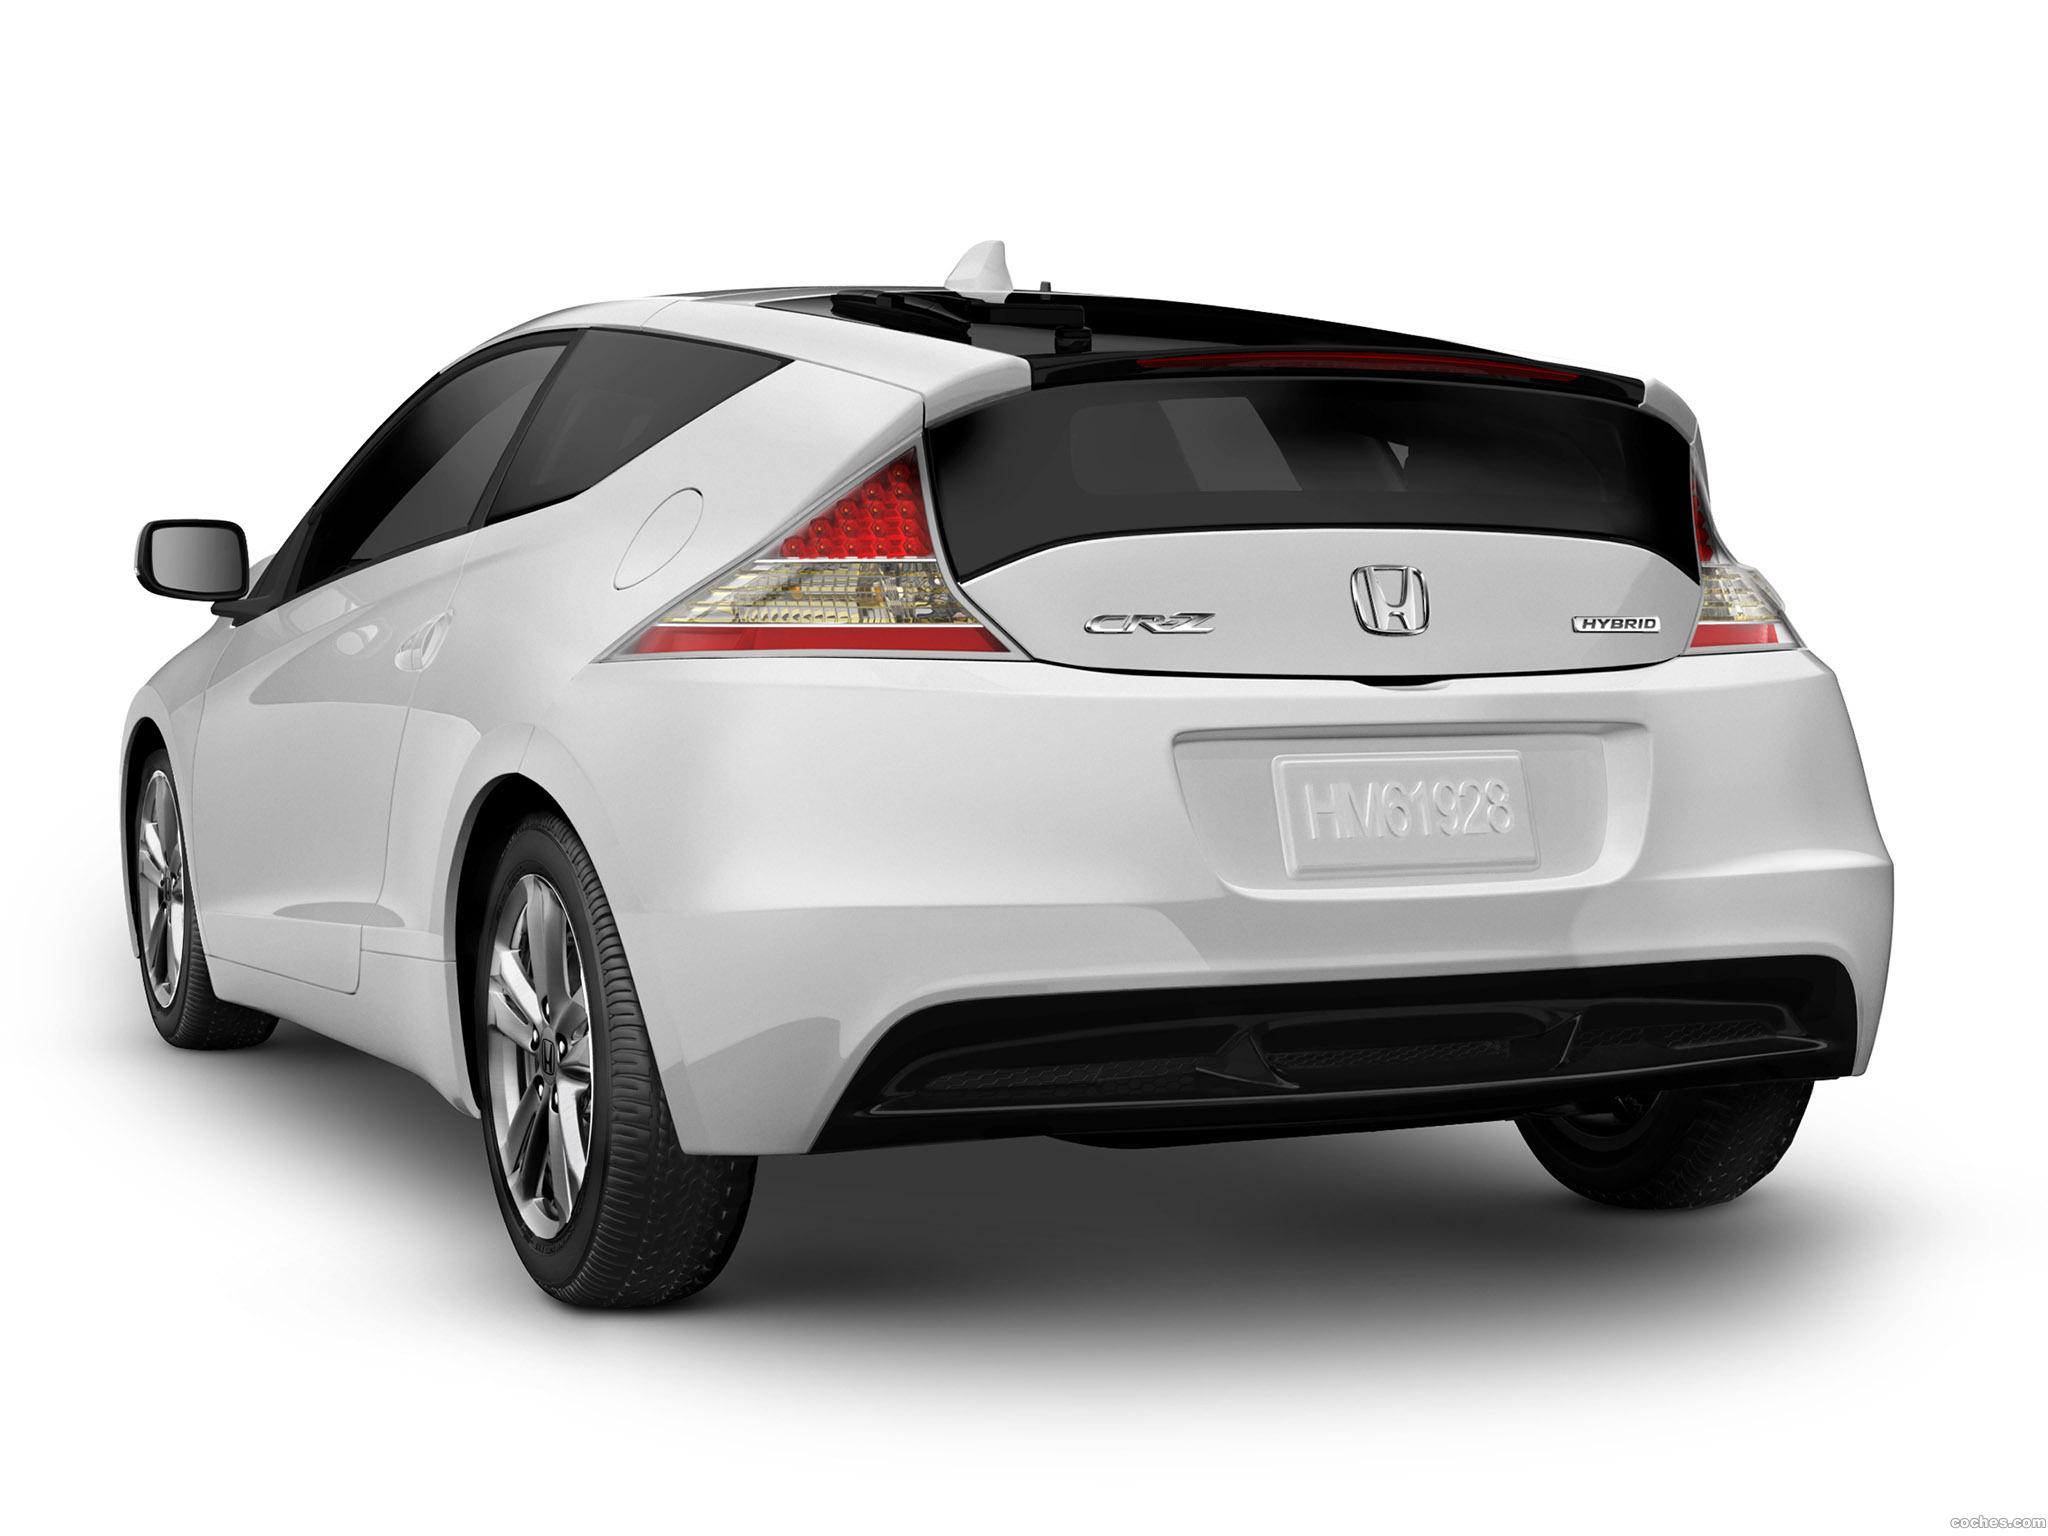 Foto 2 de Honda CR-Z Sport Hybrid Coupe 2010